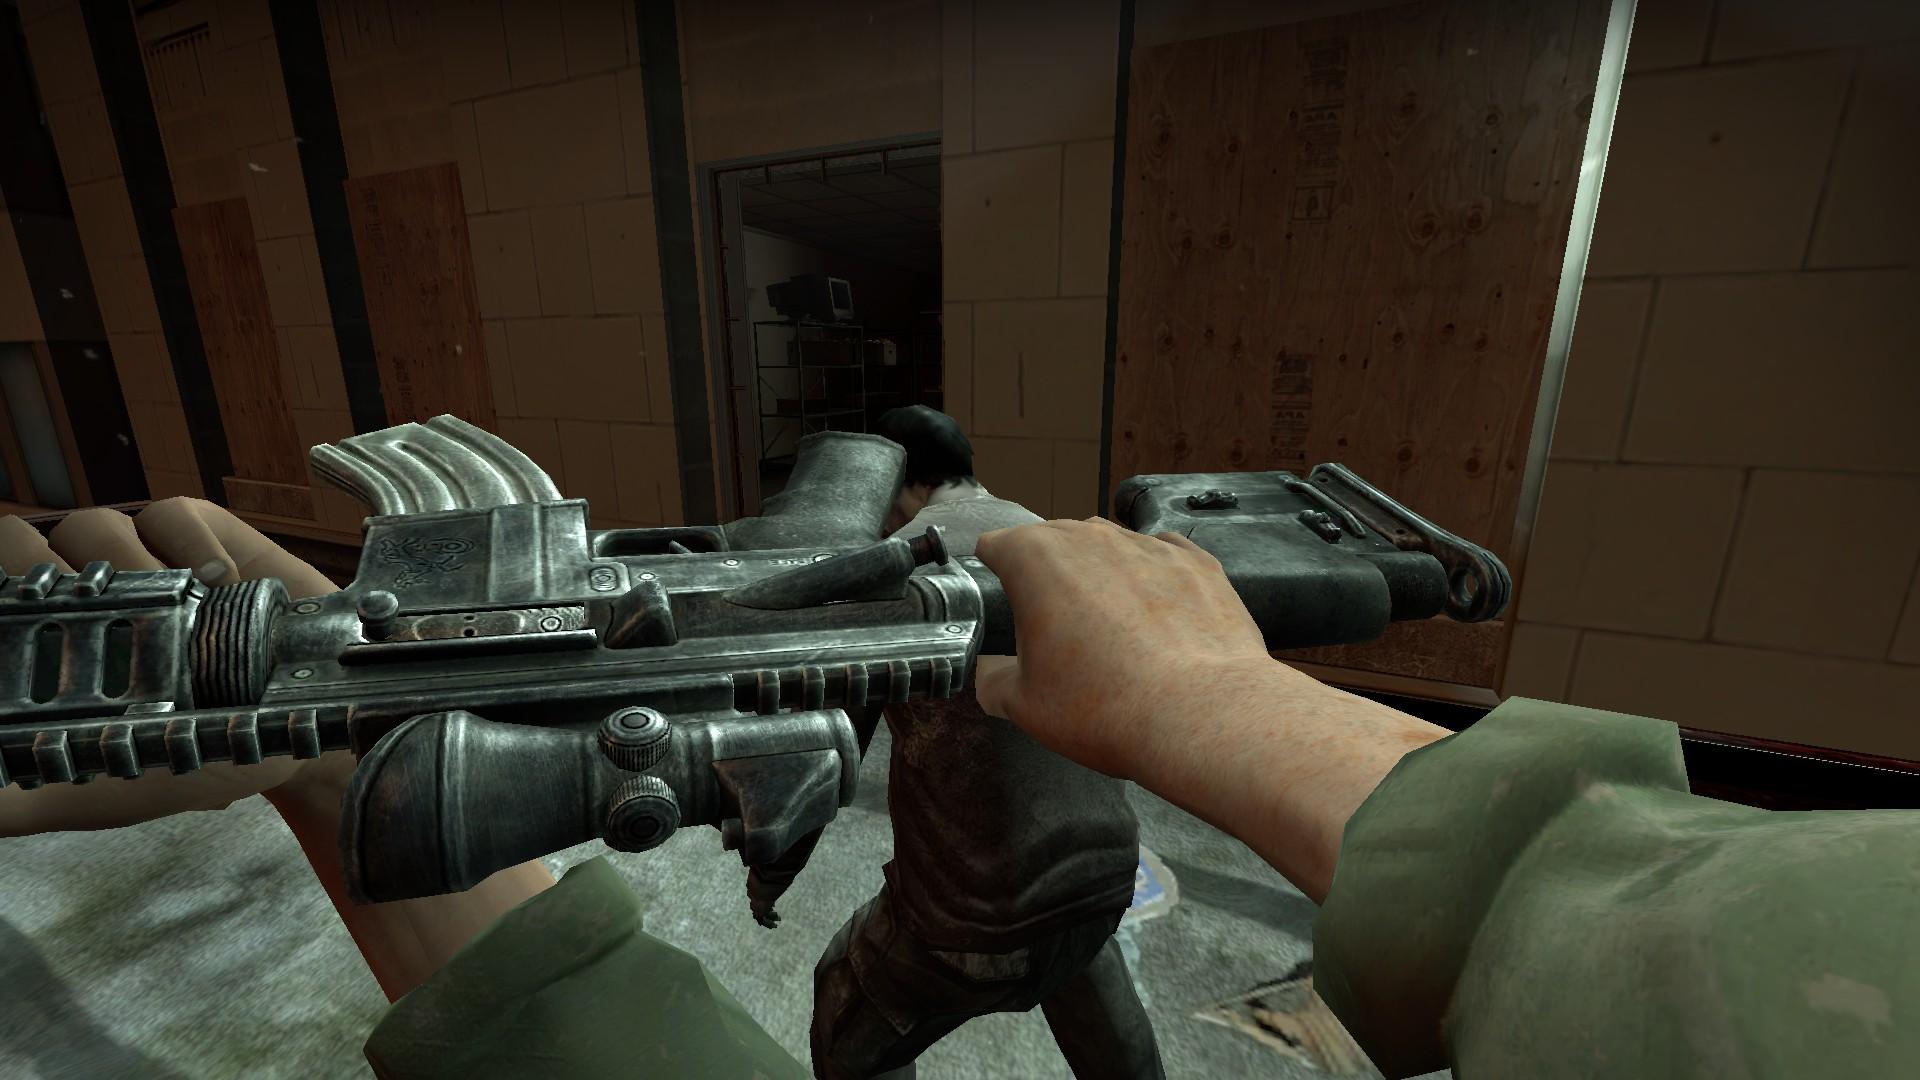 Marksman carbine fallout new vegas